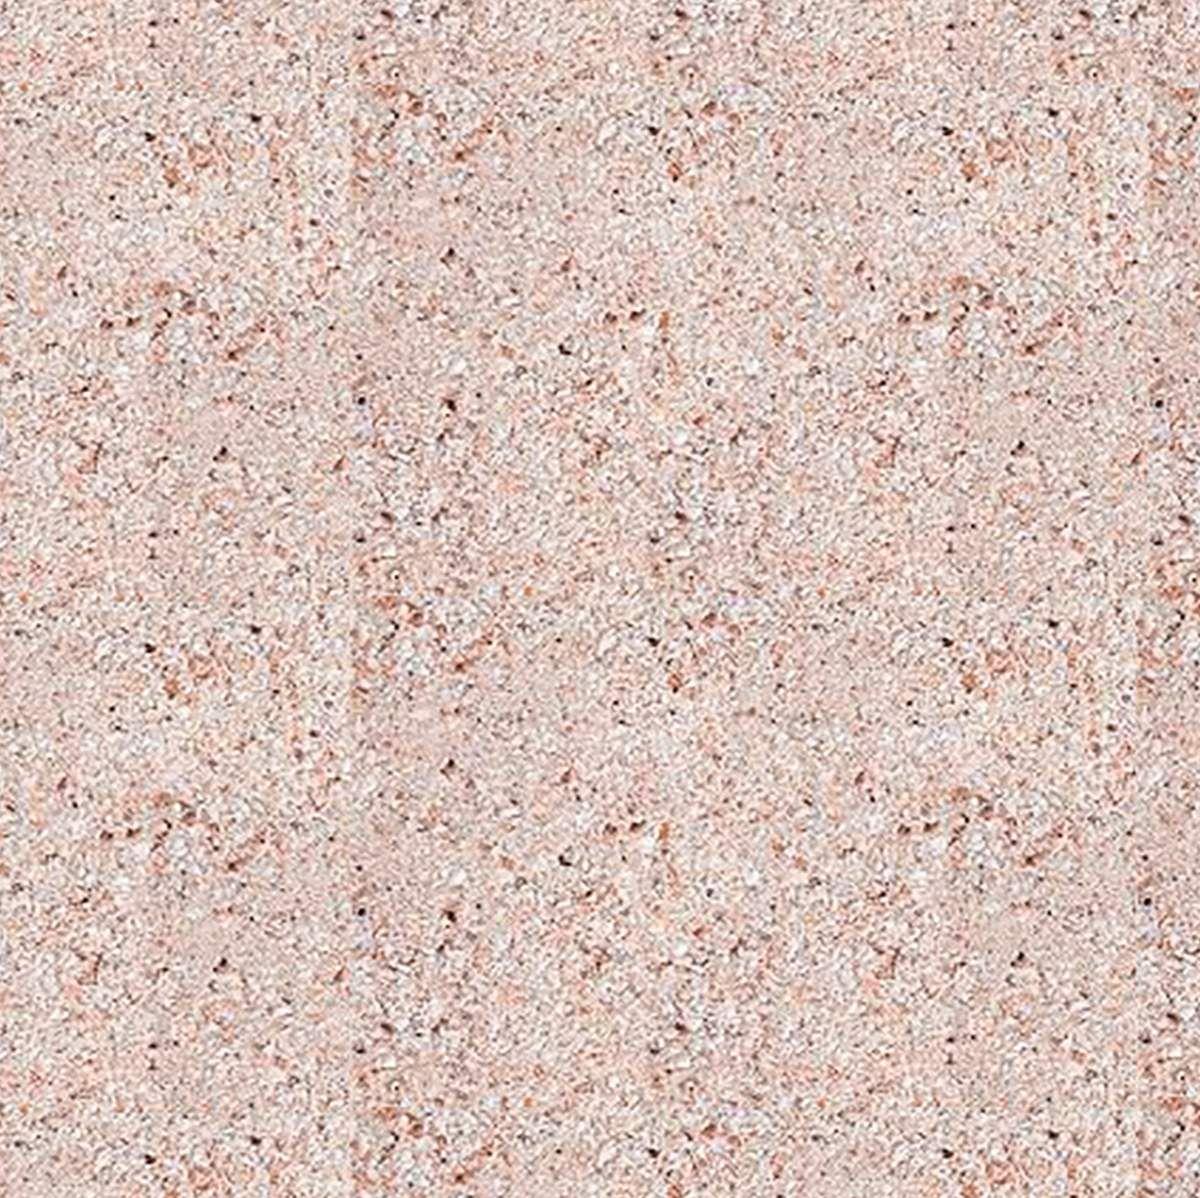 Substrato Aragonita Ocean Tech Coral Sand 1mm - 20kg